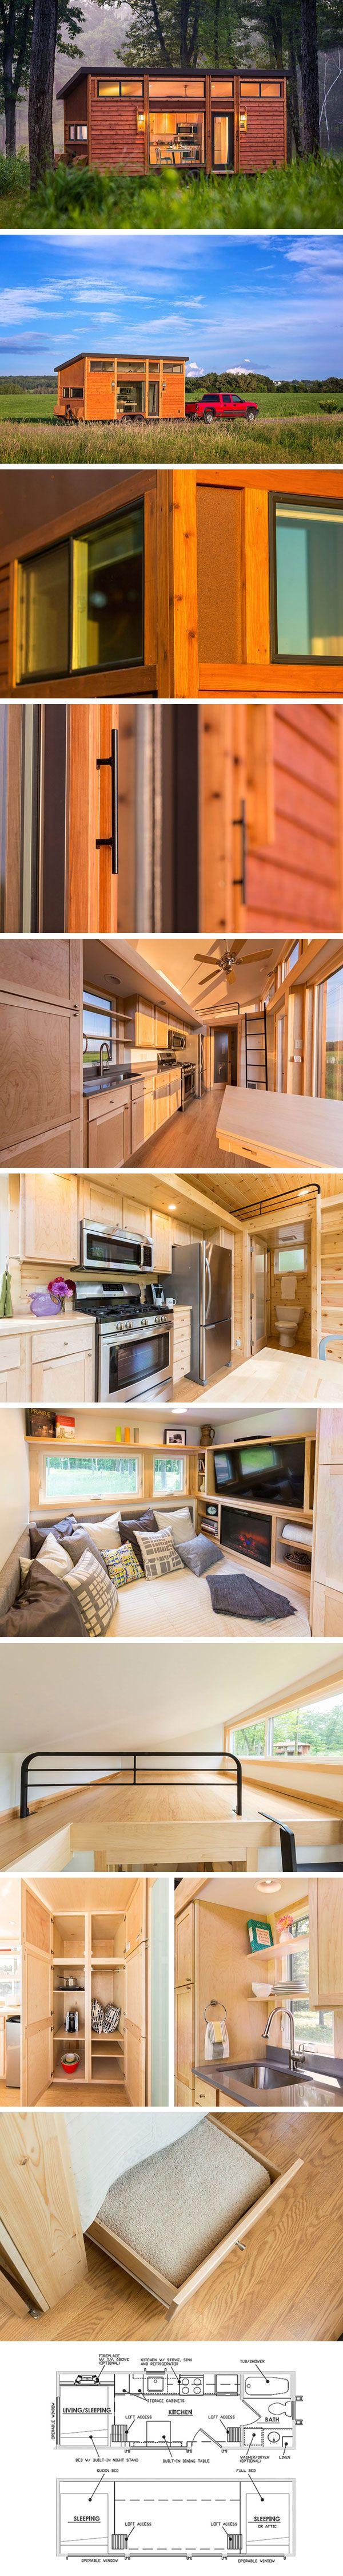 Дом на колесах Traveler от Escape Traveler #tinyhomesdigest #tinyhouse #houseonwheels #camper